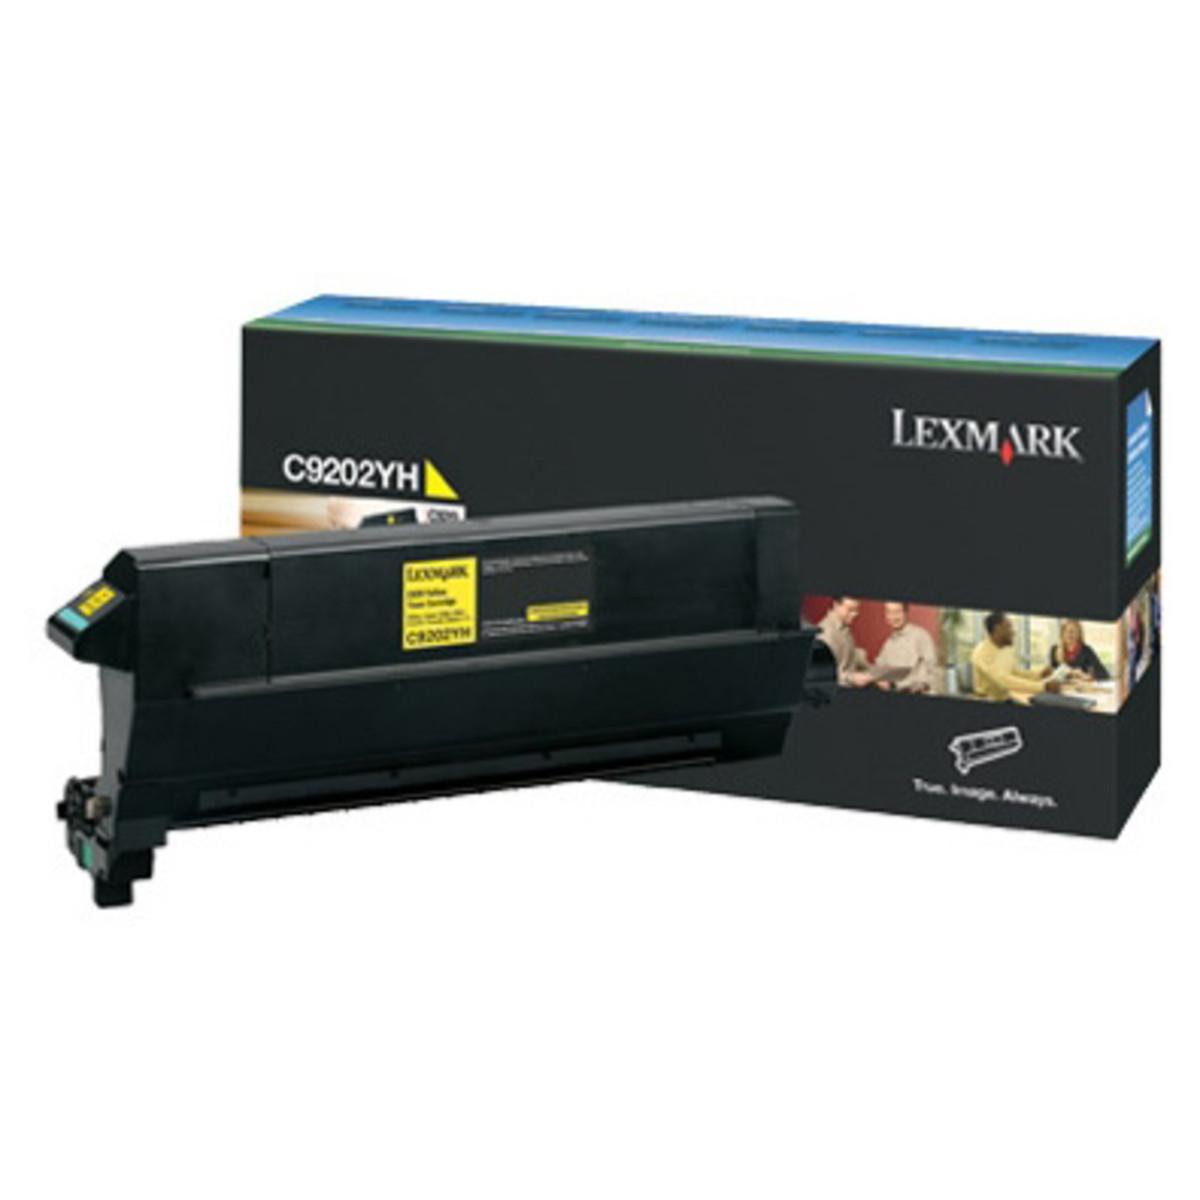 Lexmark C9202YH Yellow Toner Cartridge